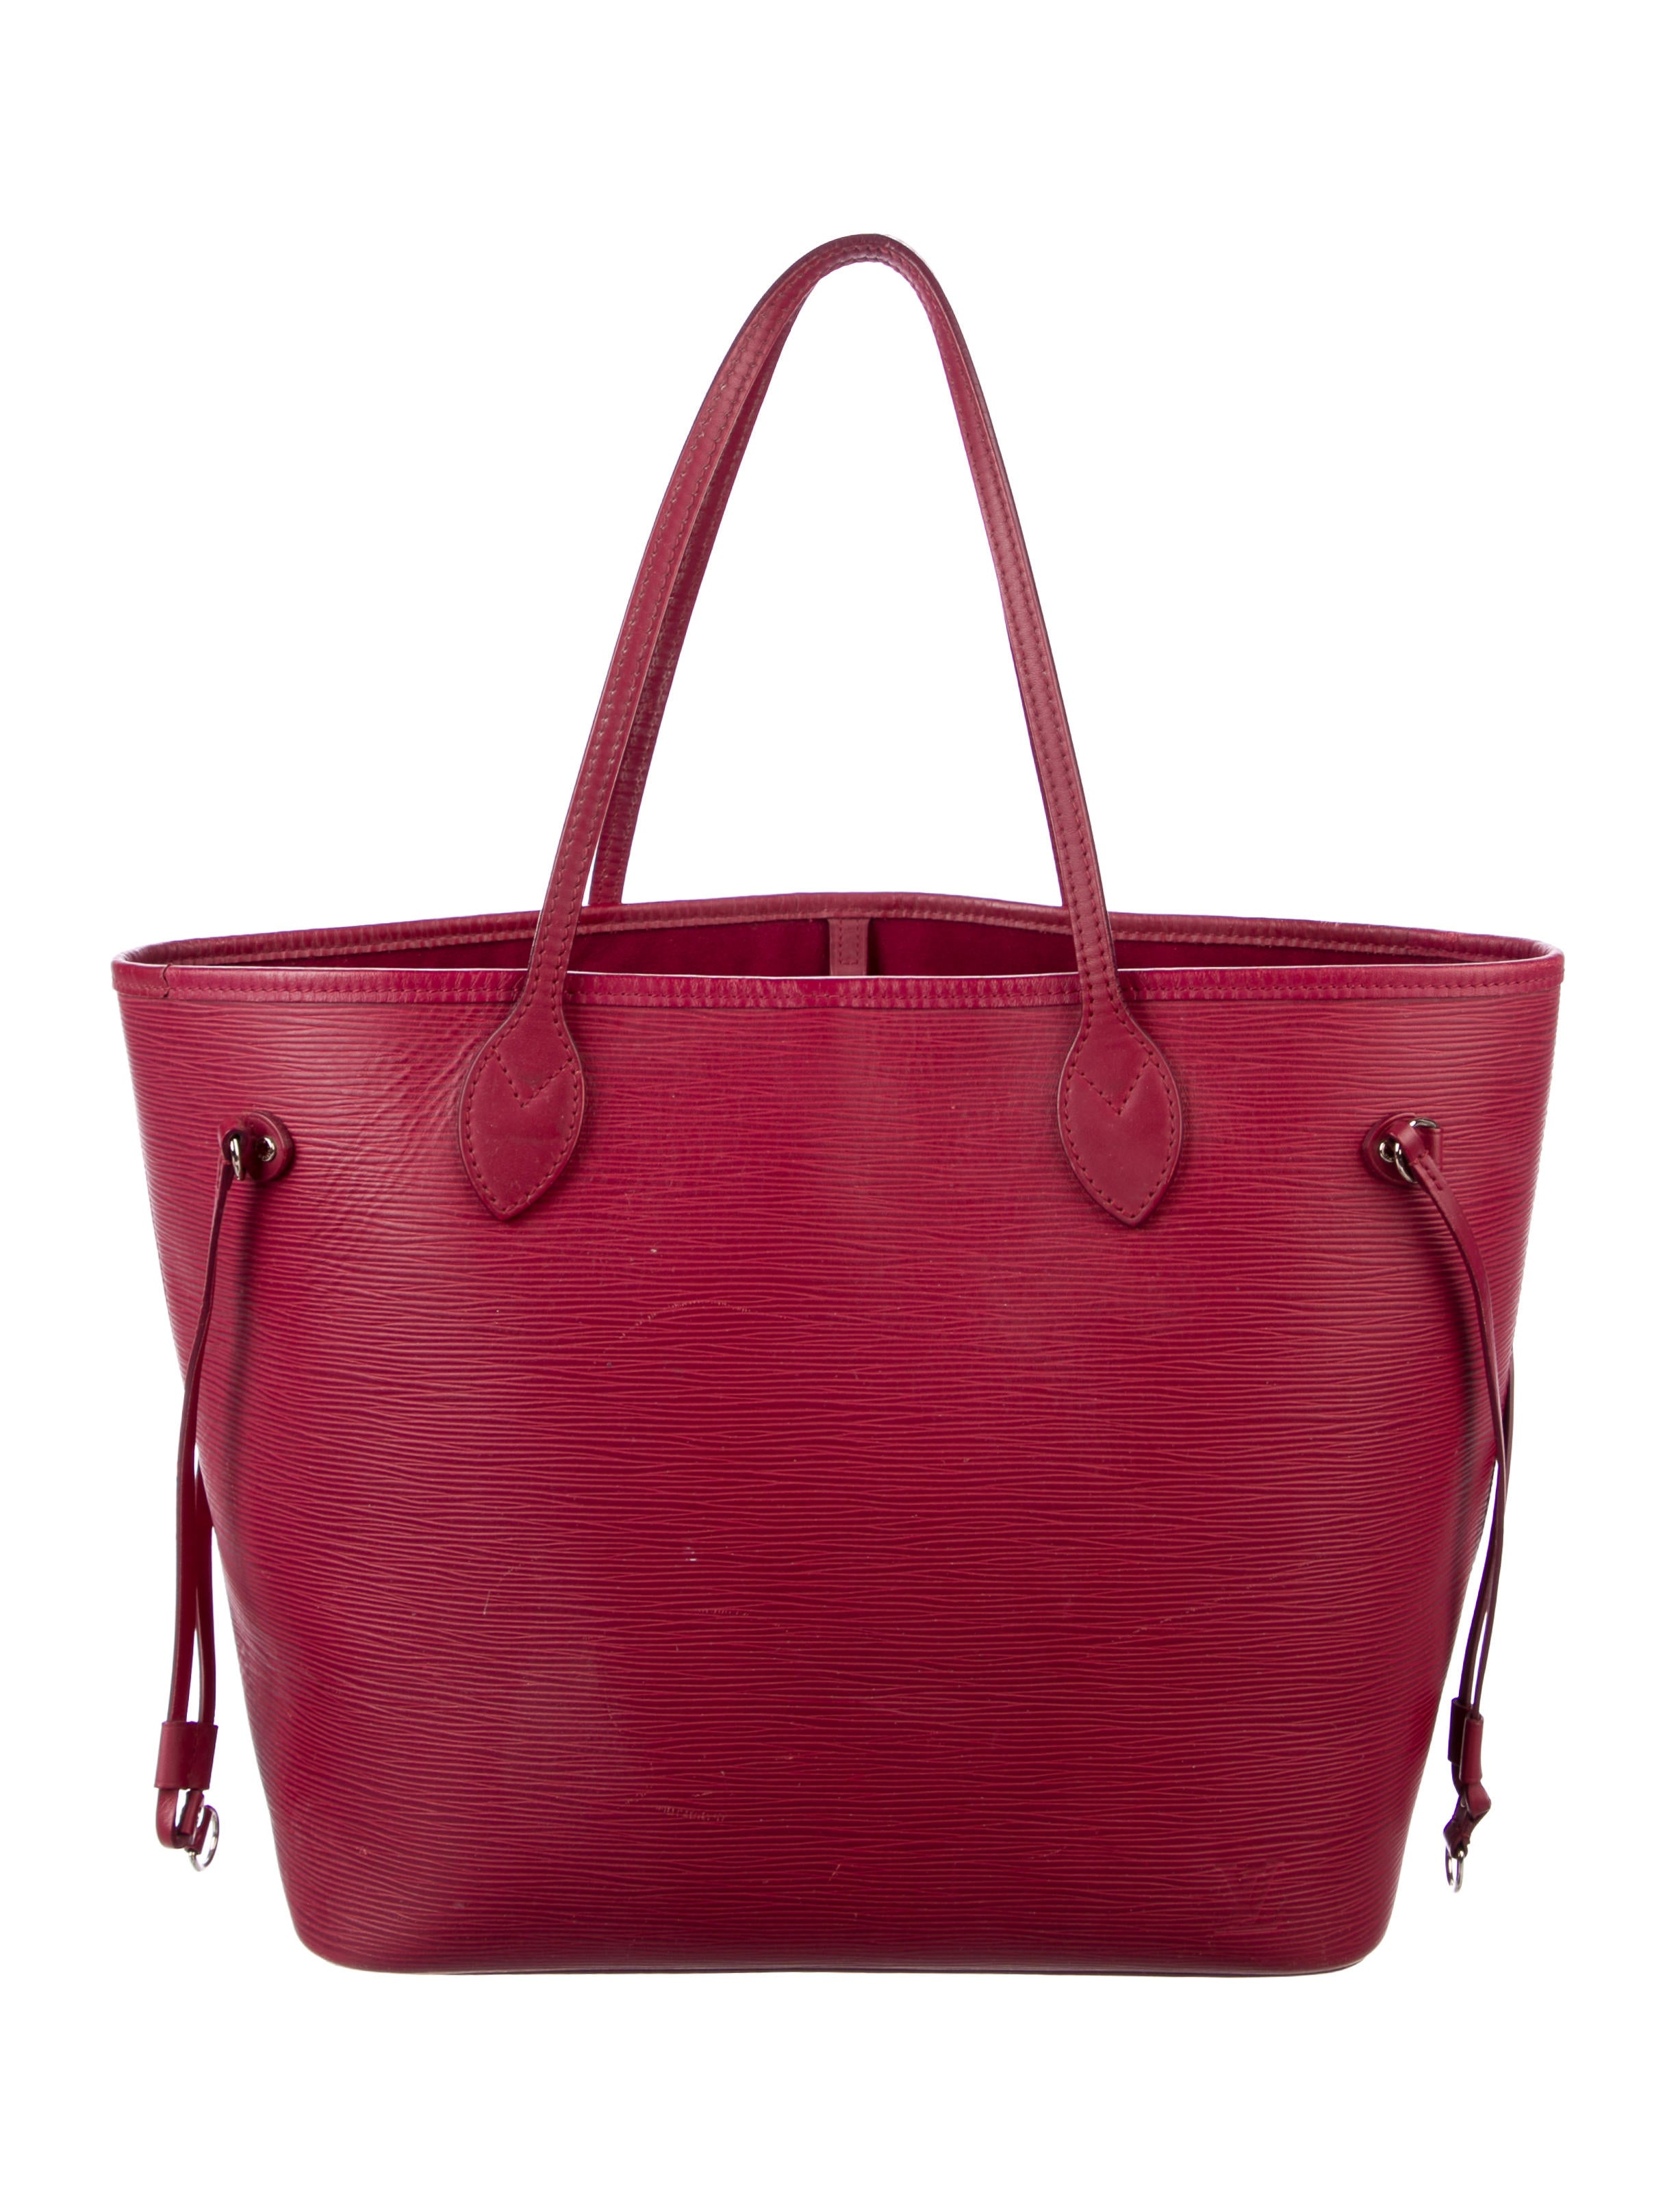 0fcd9b88ef60 Louis Vuitton Epi Neverfull MM w  Pouch - Handbags - LOU221523